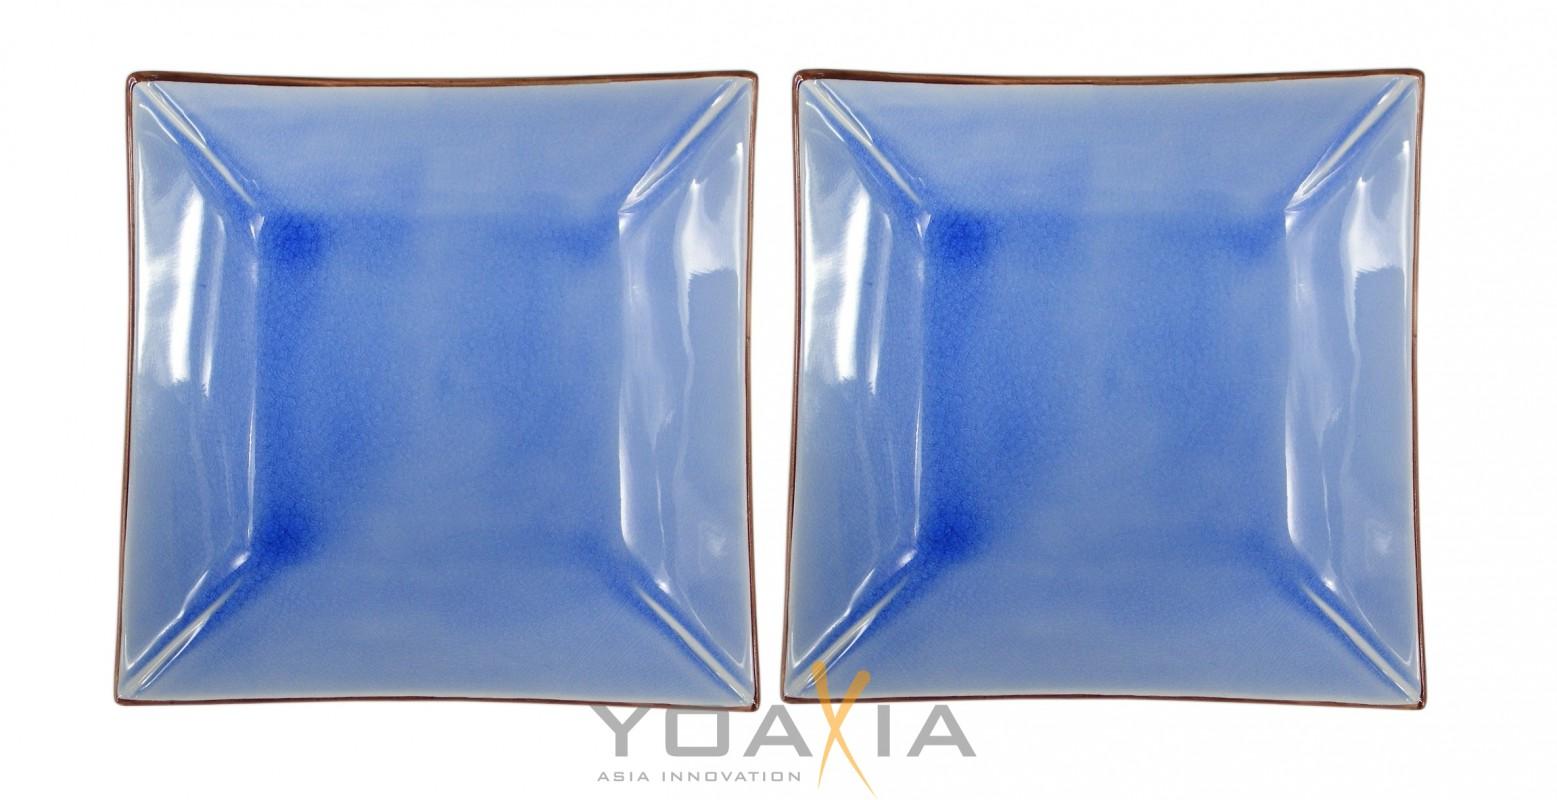 [ bleu ] 2x Keramik- Teller / Sushi-Teller / Obstschale 23 cm x 23 cm